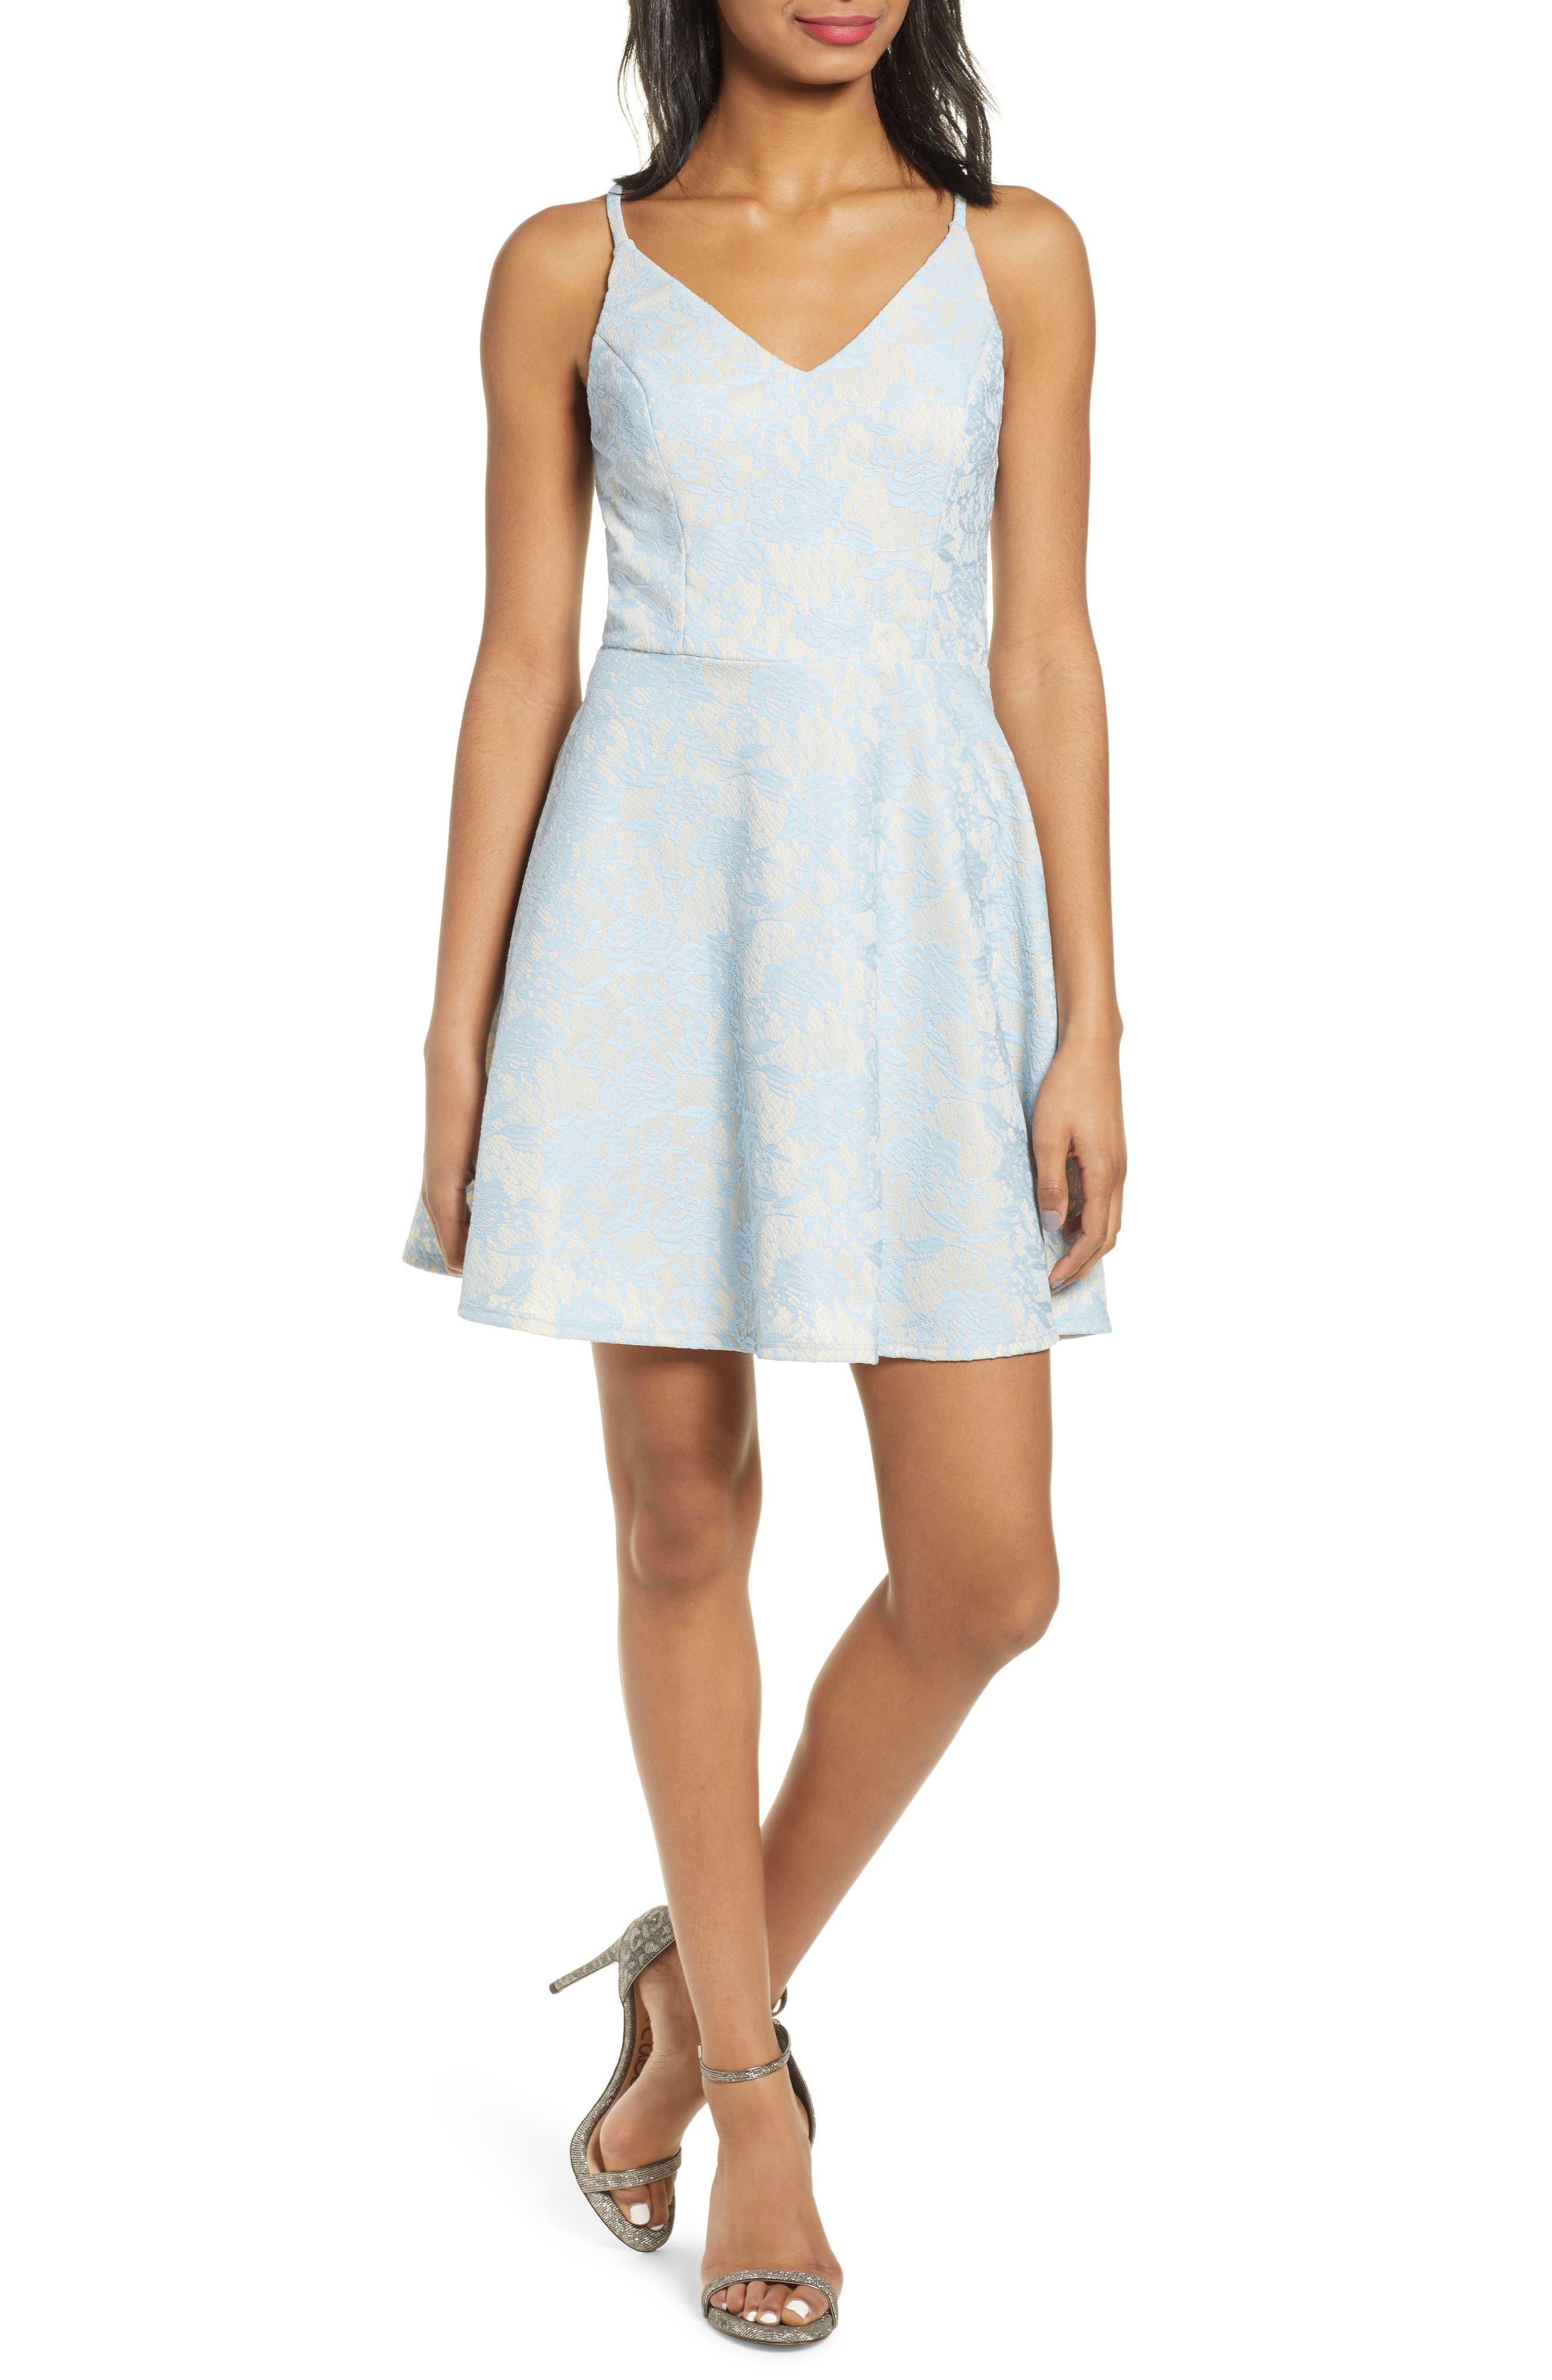 Speechless Bonded Lace Open Back Fit & Flare Dress, Blue